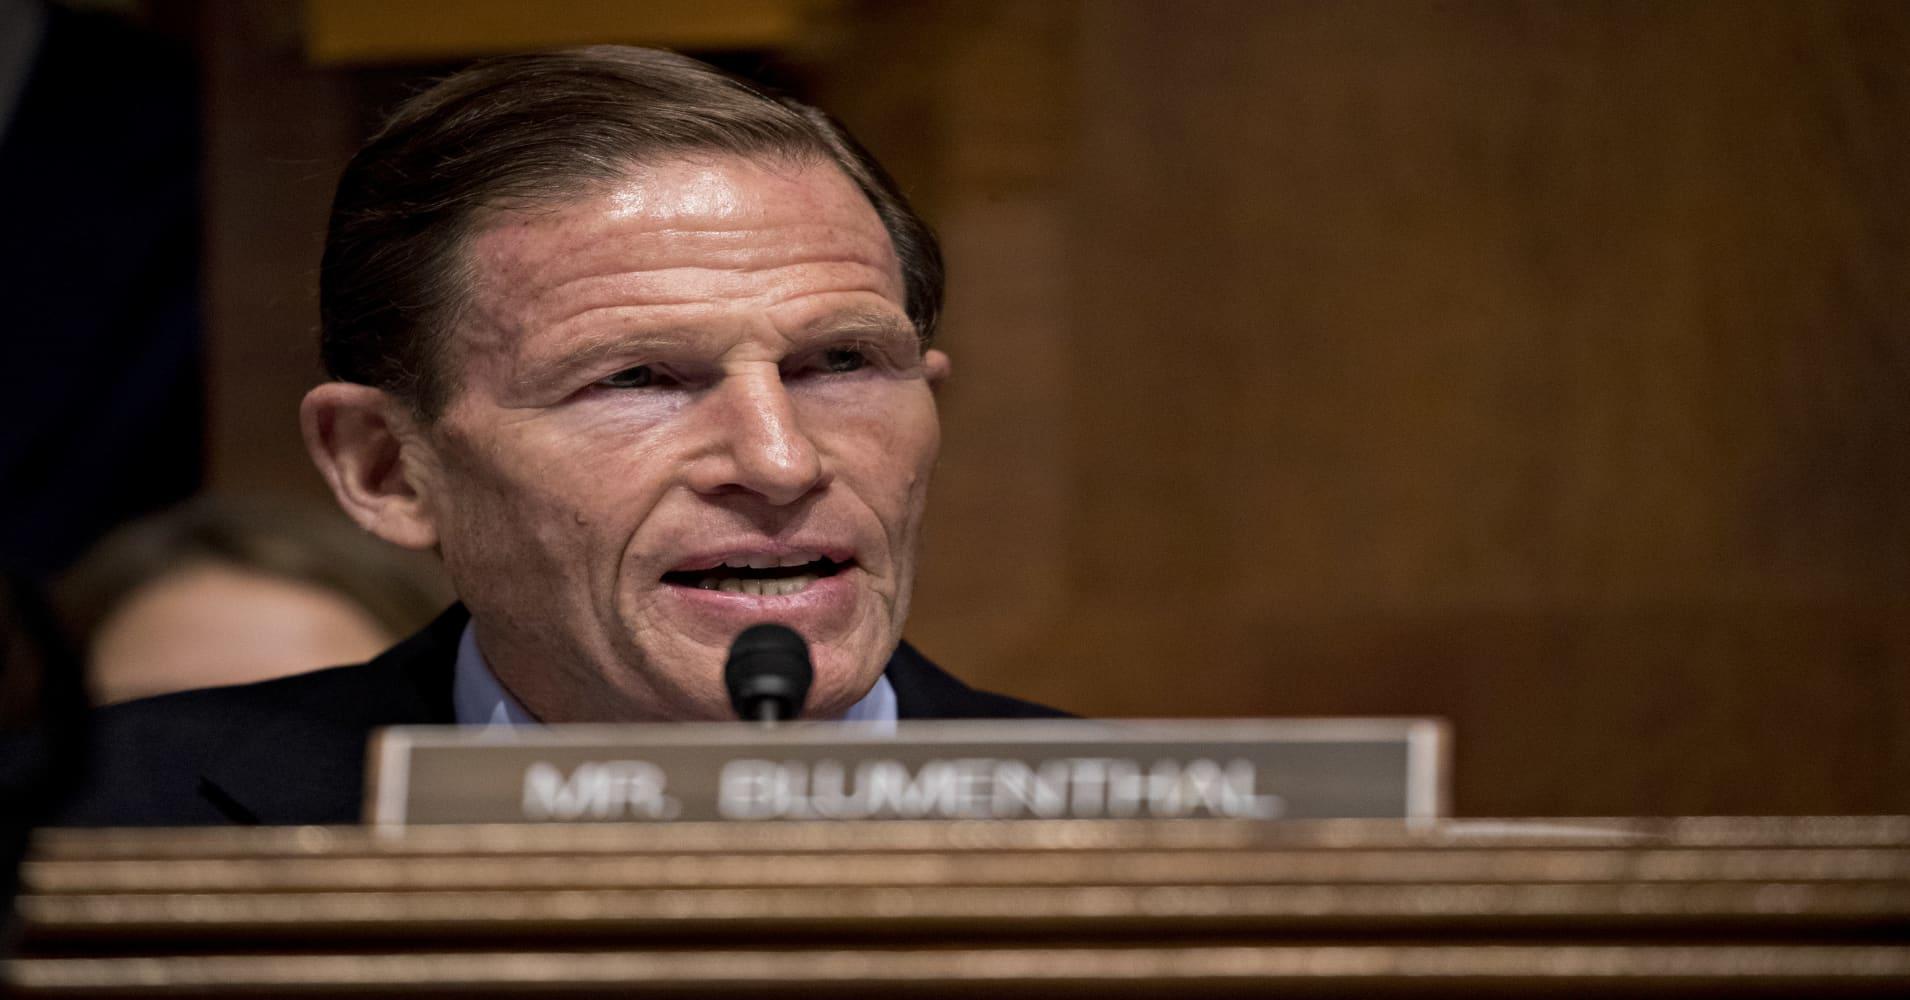 Facebook needs to be broken up, says Senator Richard Blumenthal